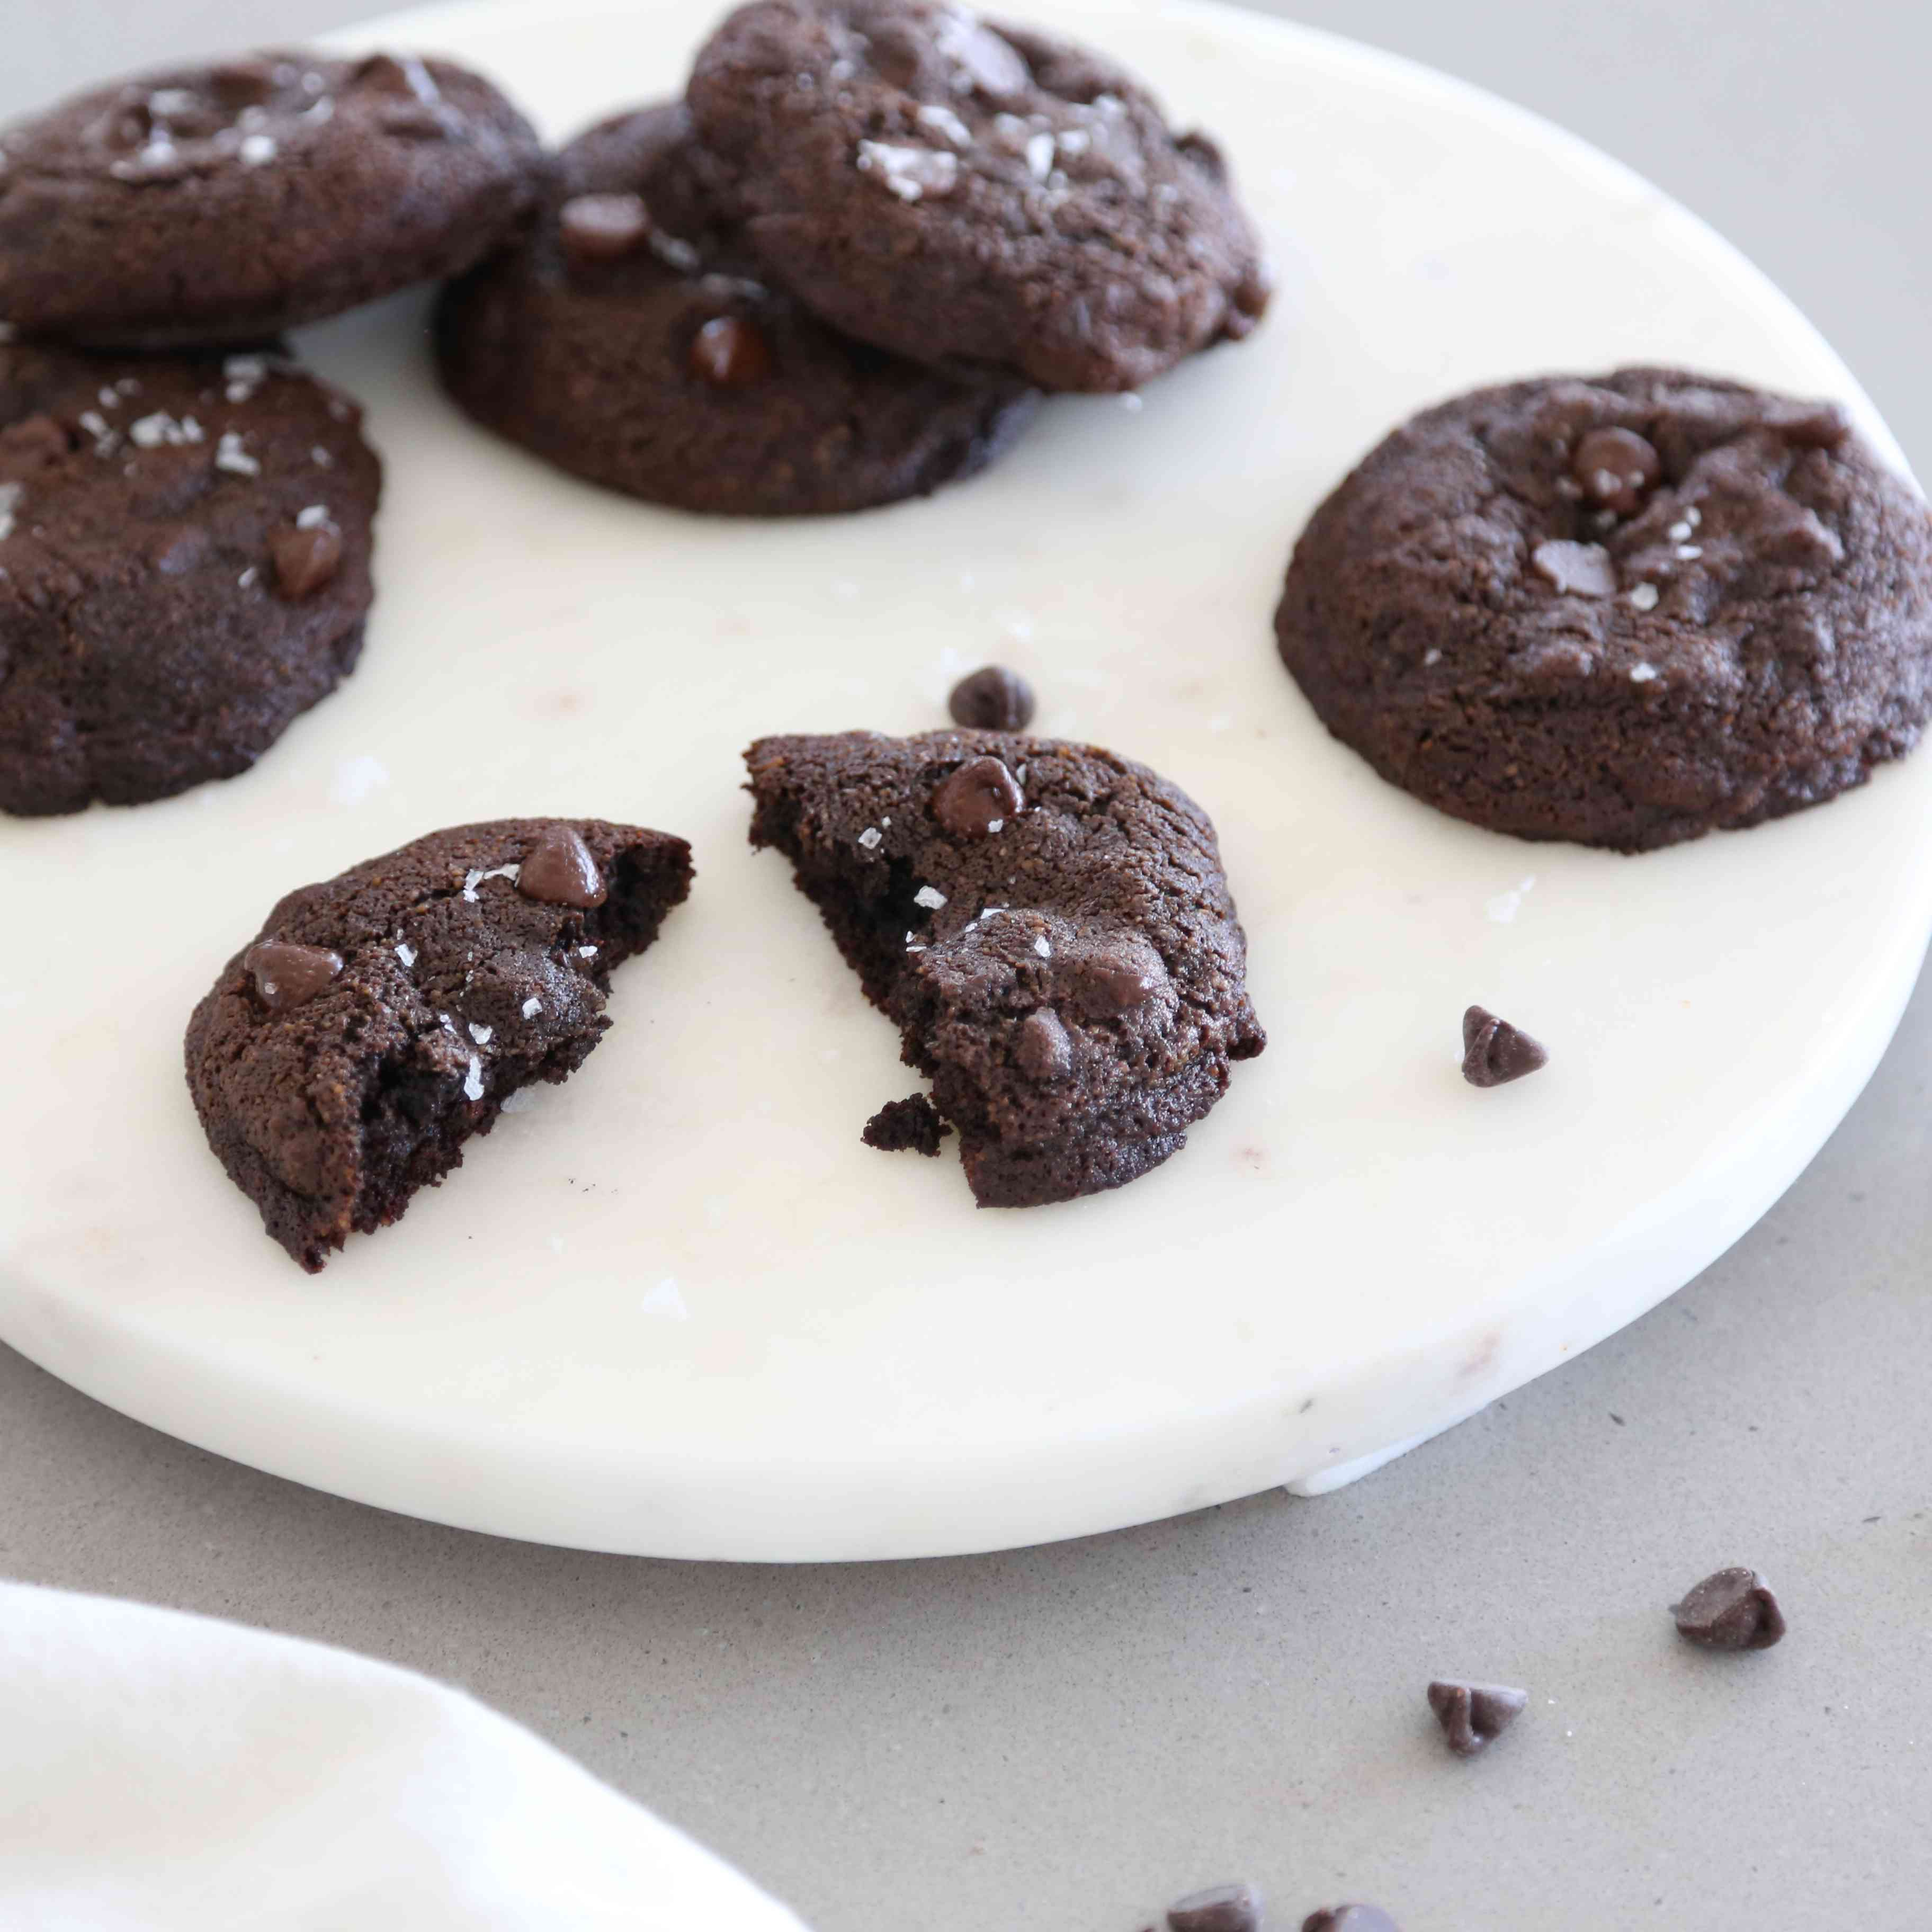 Keto Chocolate Cookies Tester Image